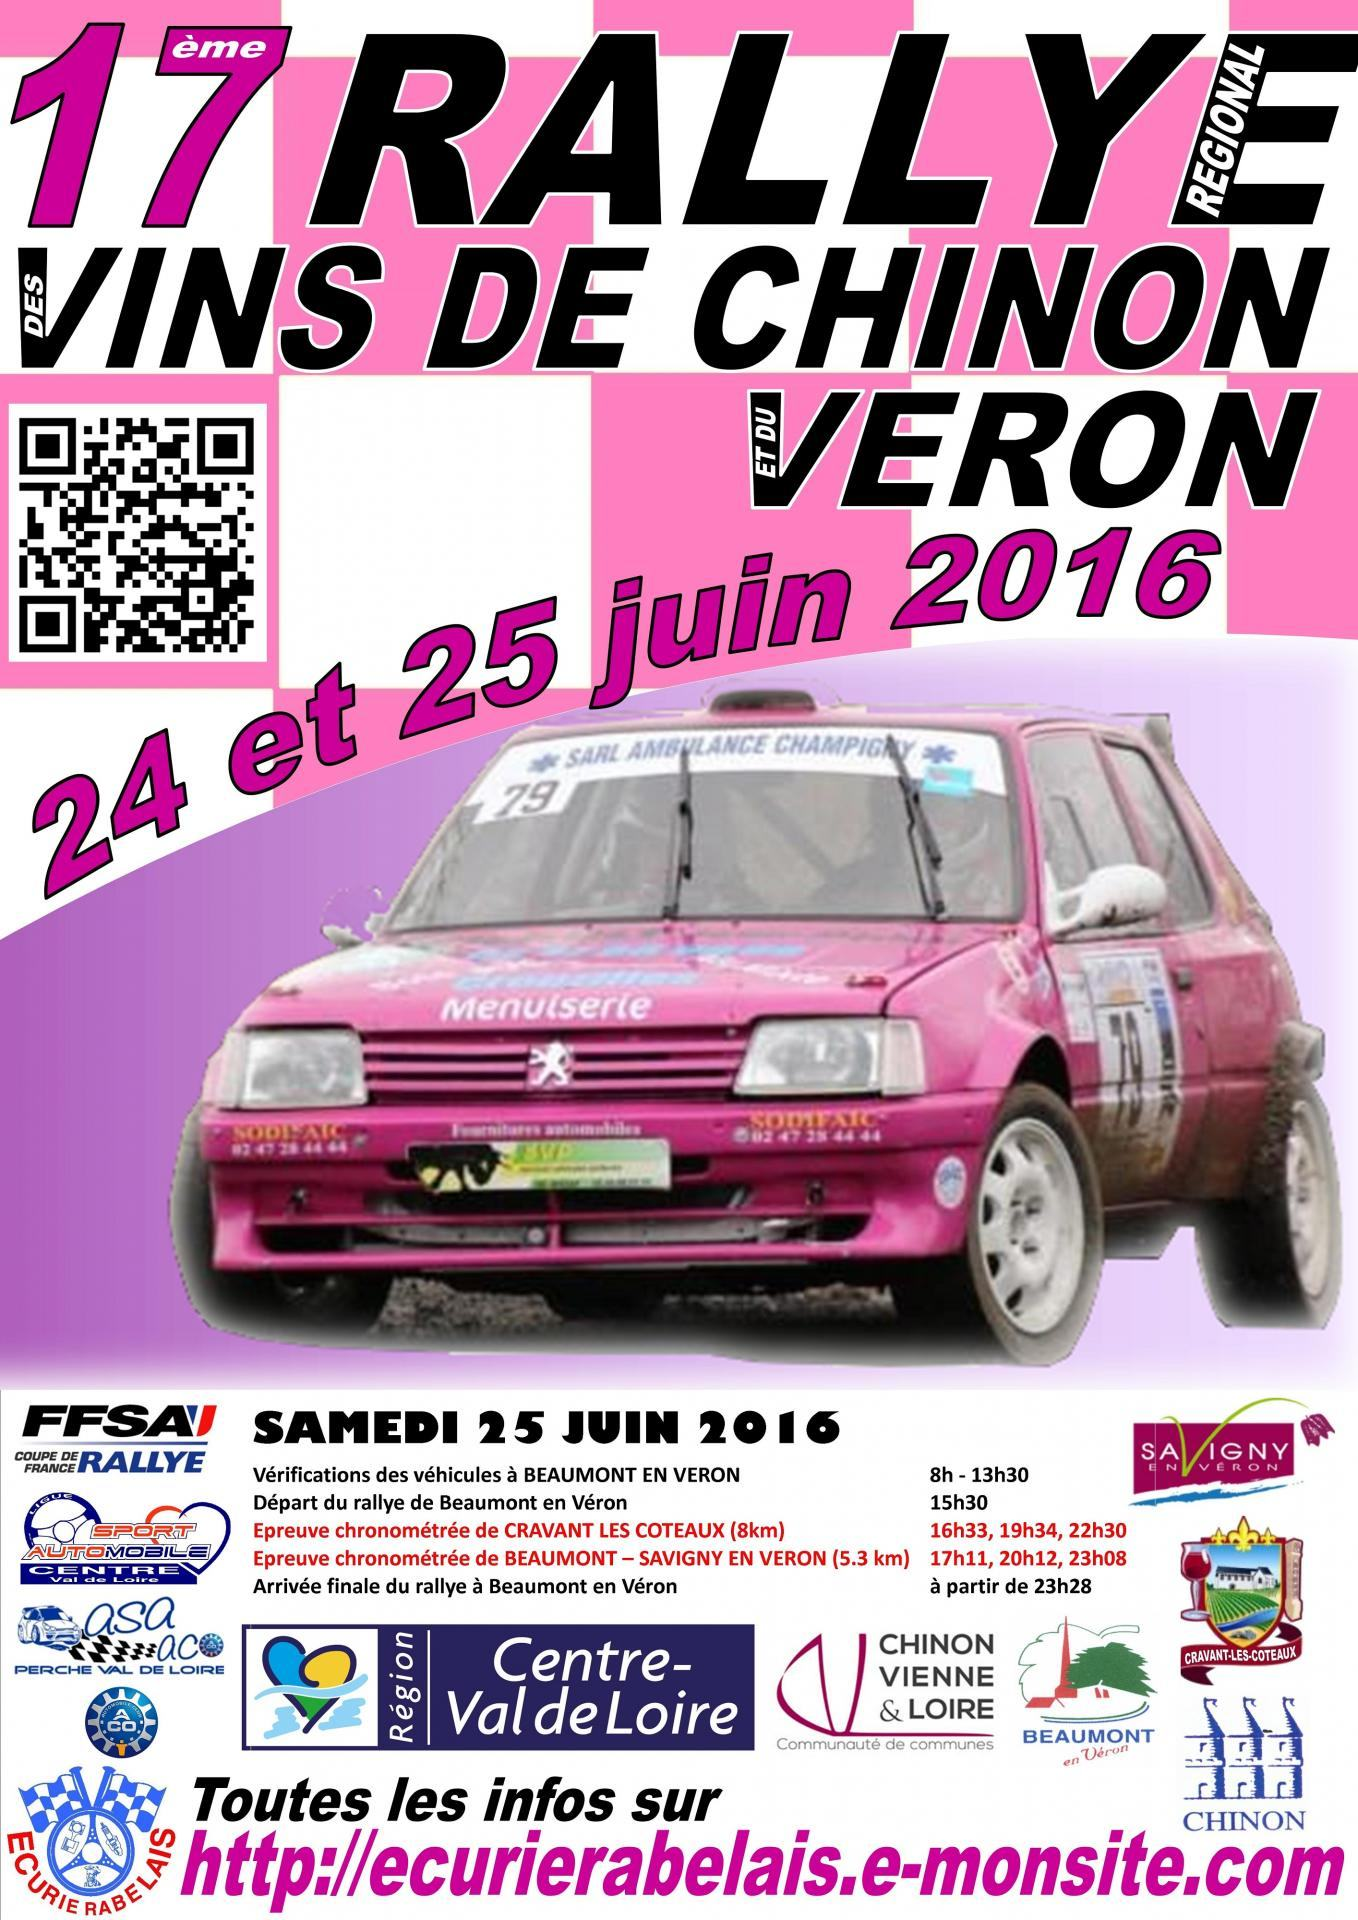 Rallye-des-Vins-de-Chinon-2016